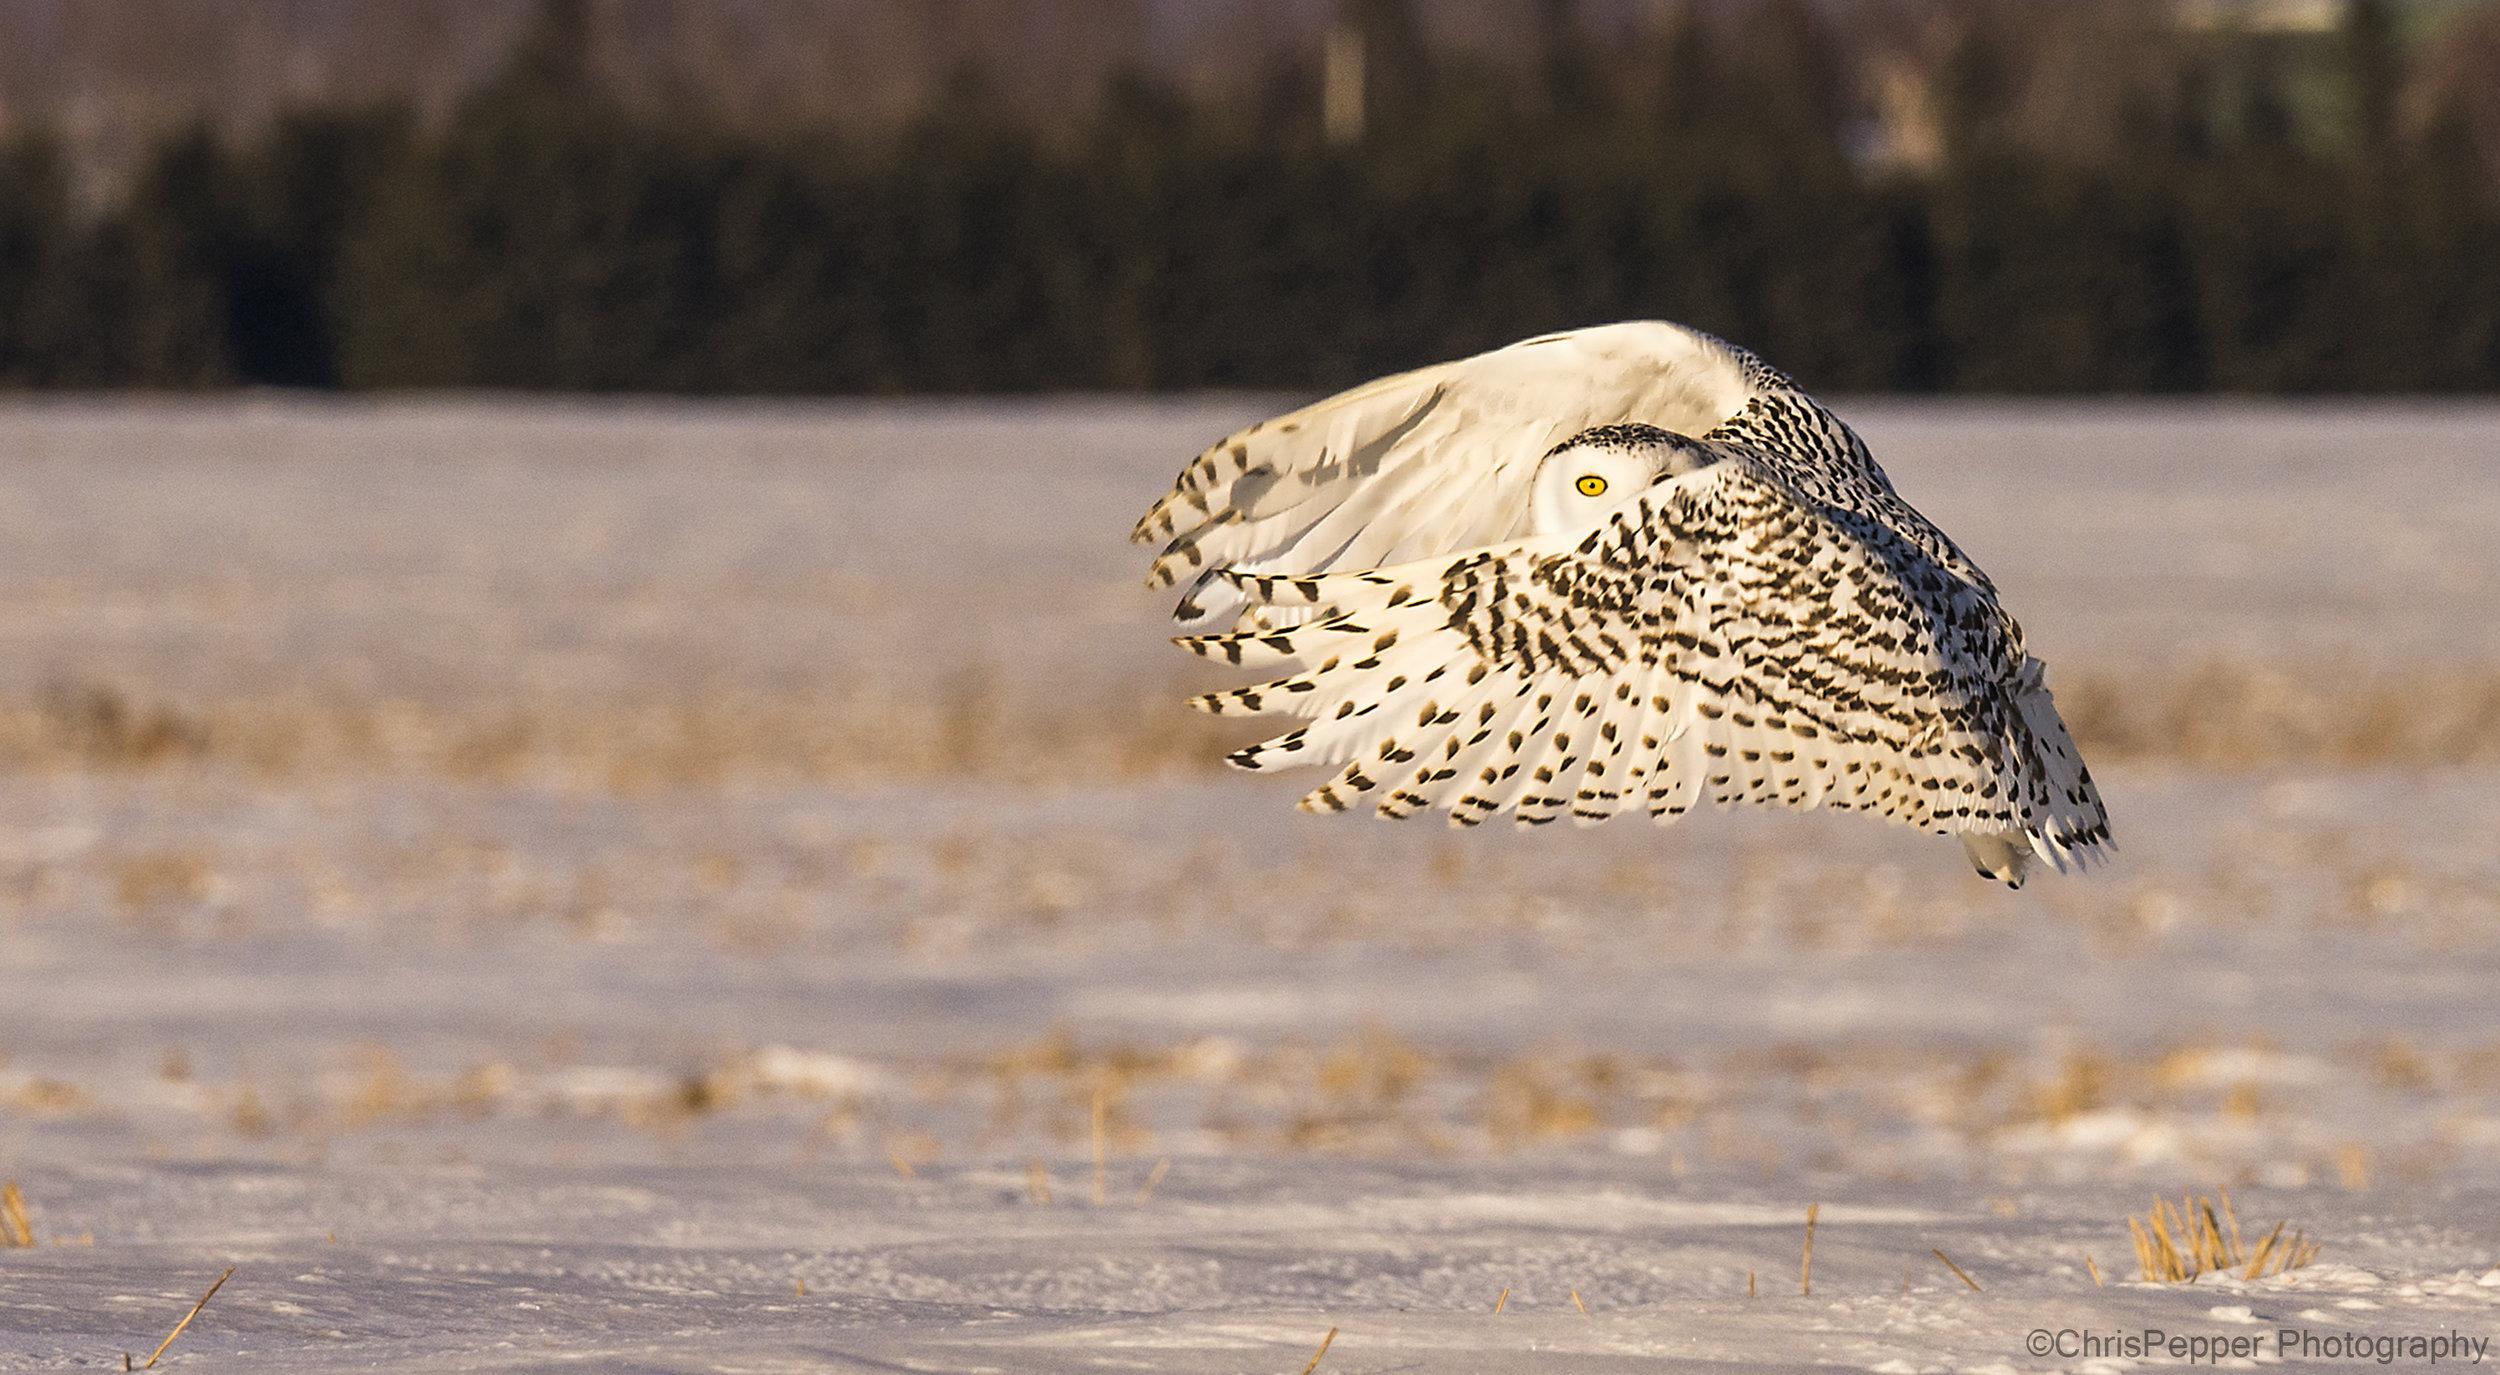 Peek a boo snowy owl photo workshops